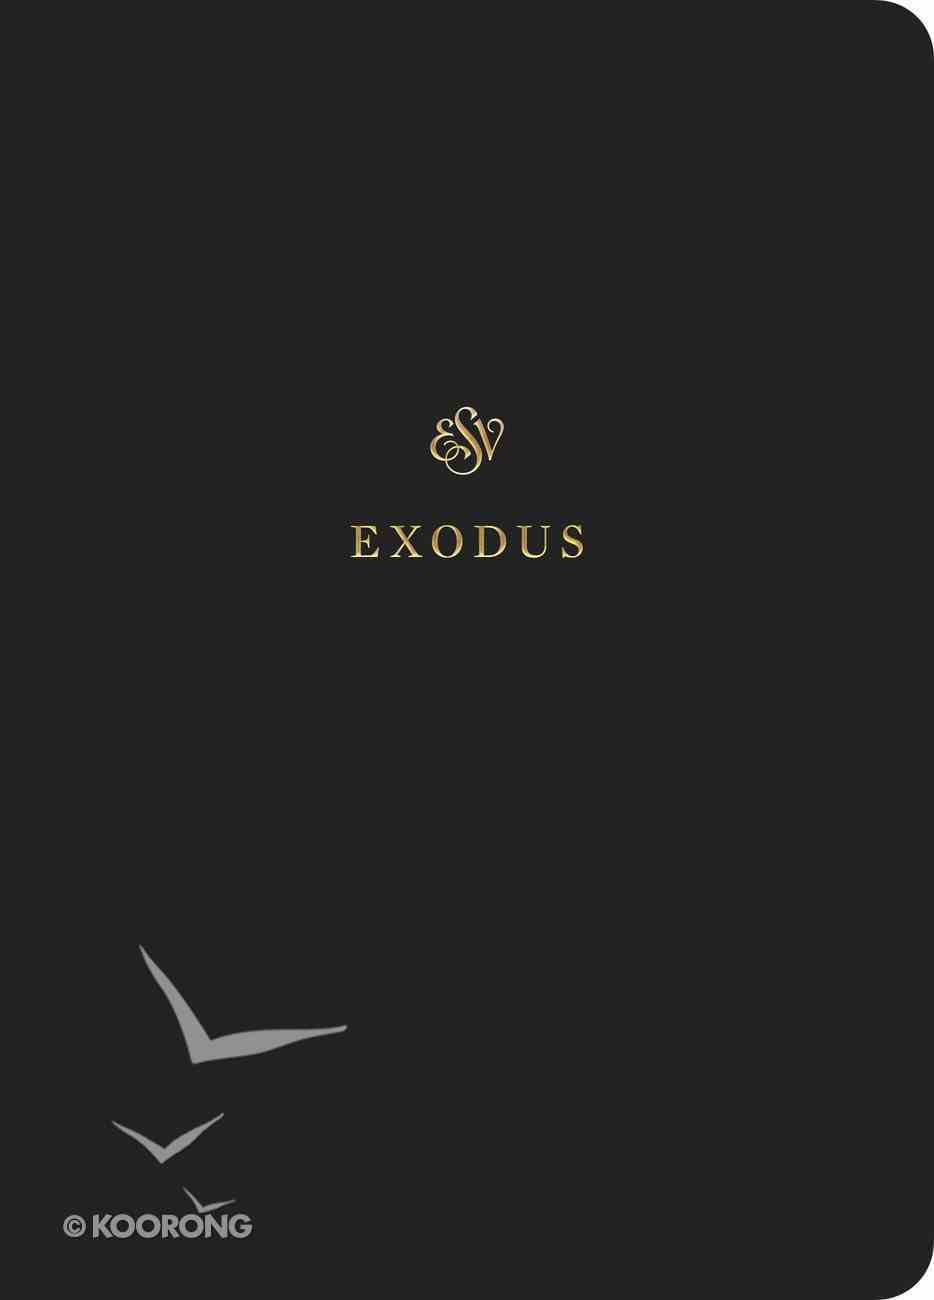 ESV Scripture Journal Exodus Paperback